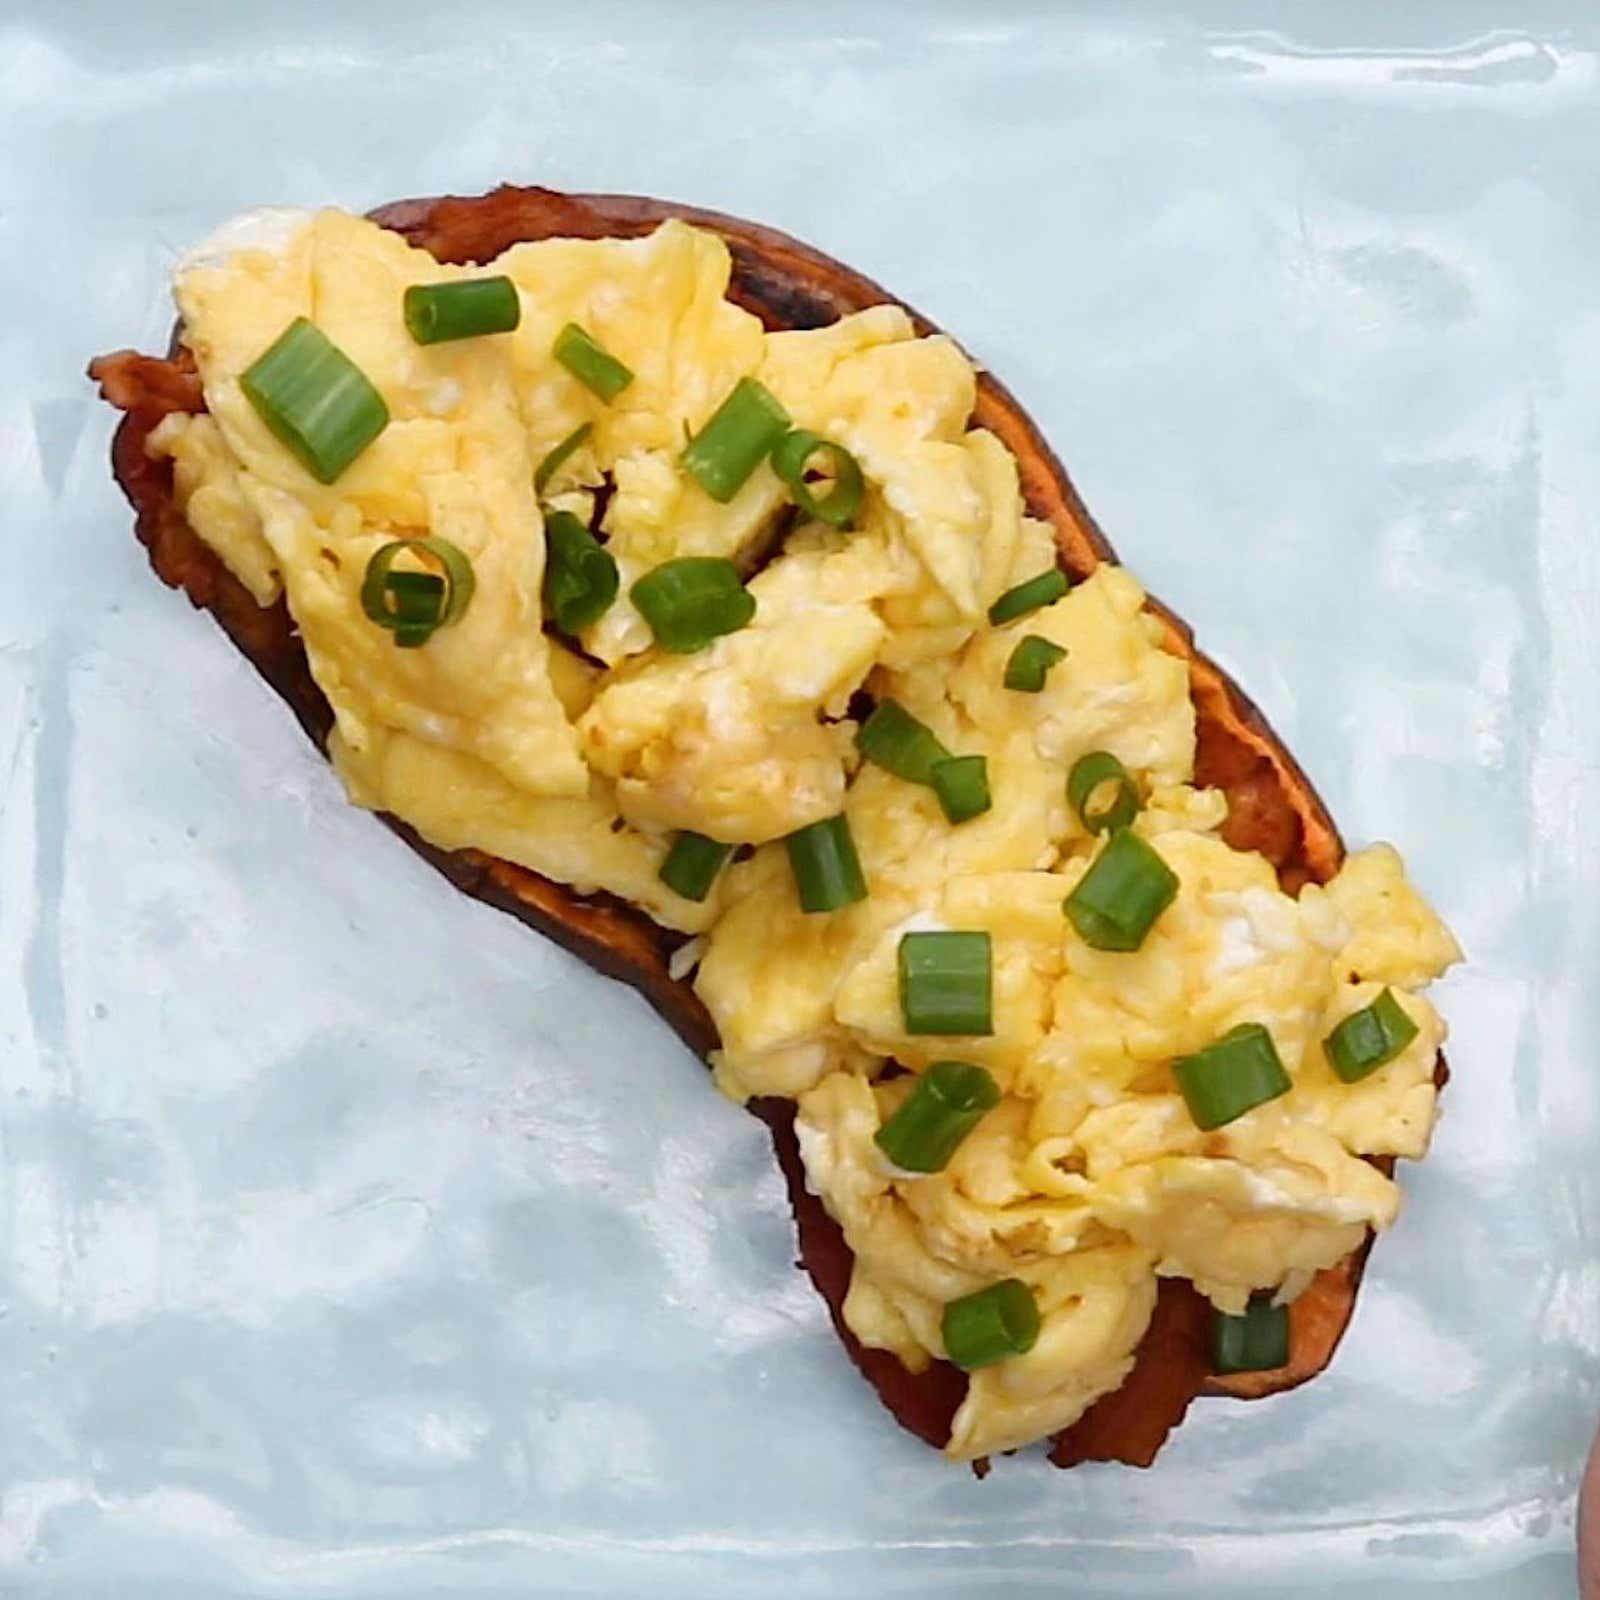 Bacon & Eggs Sweet Potato Toast